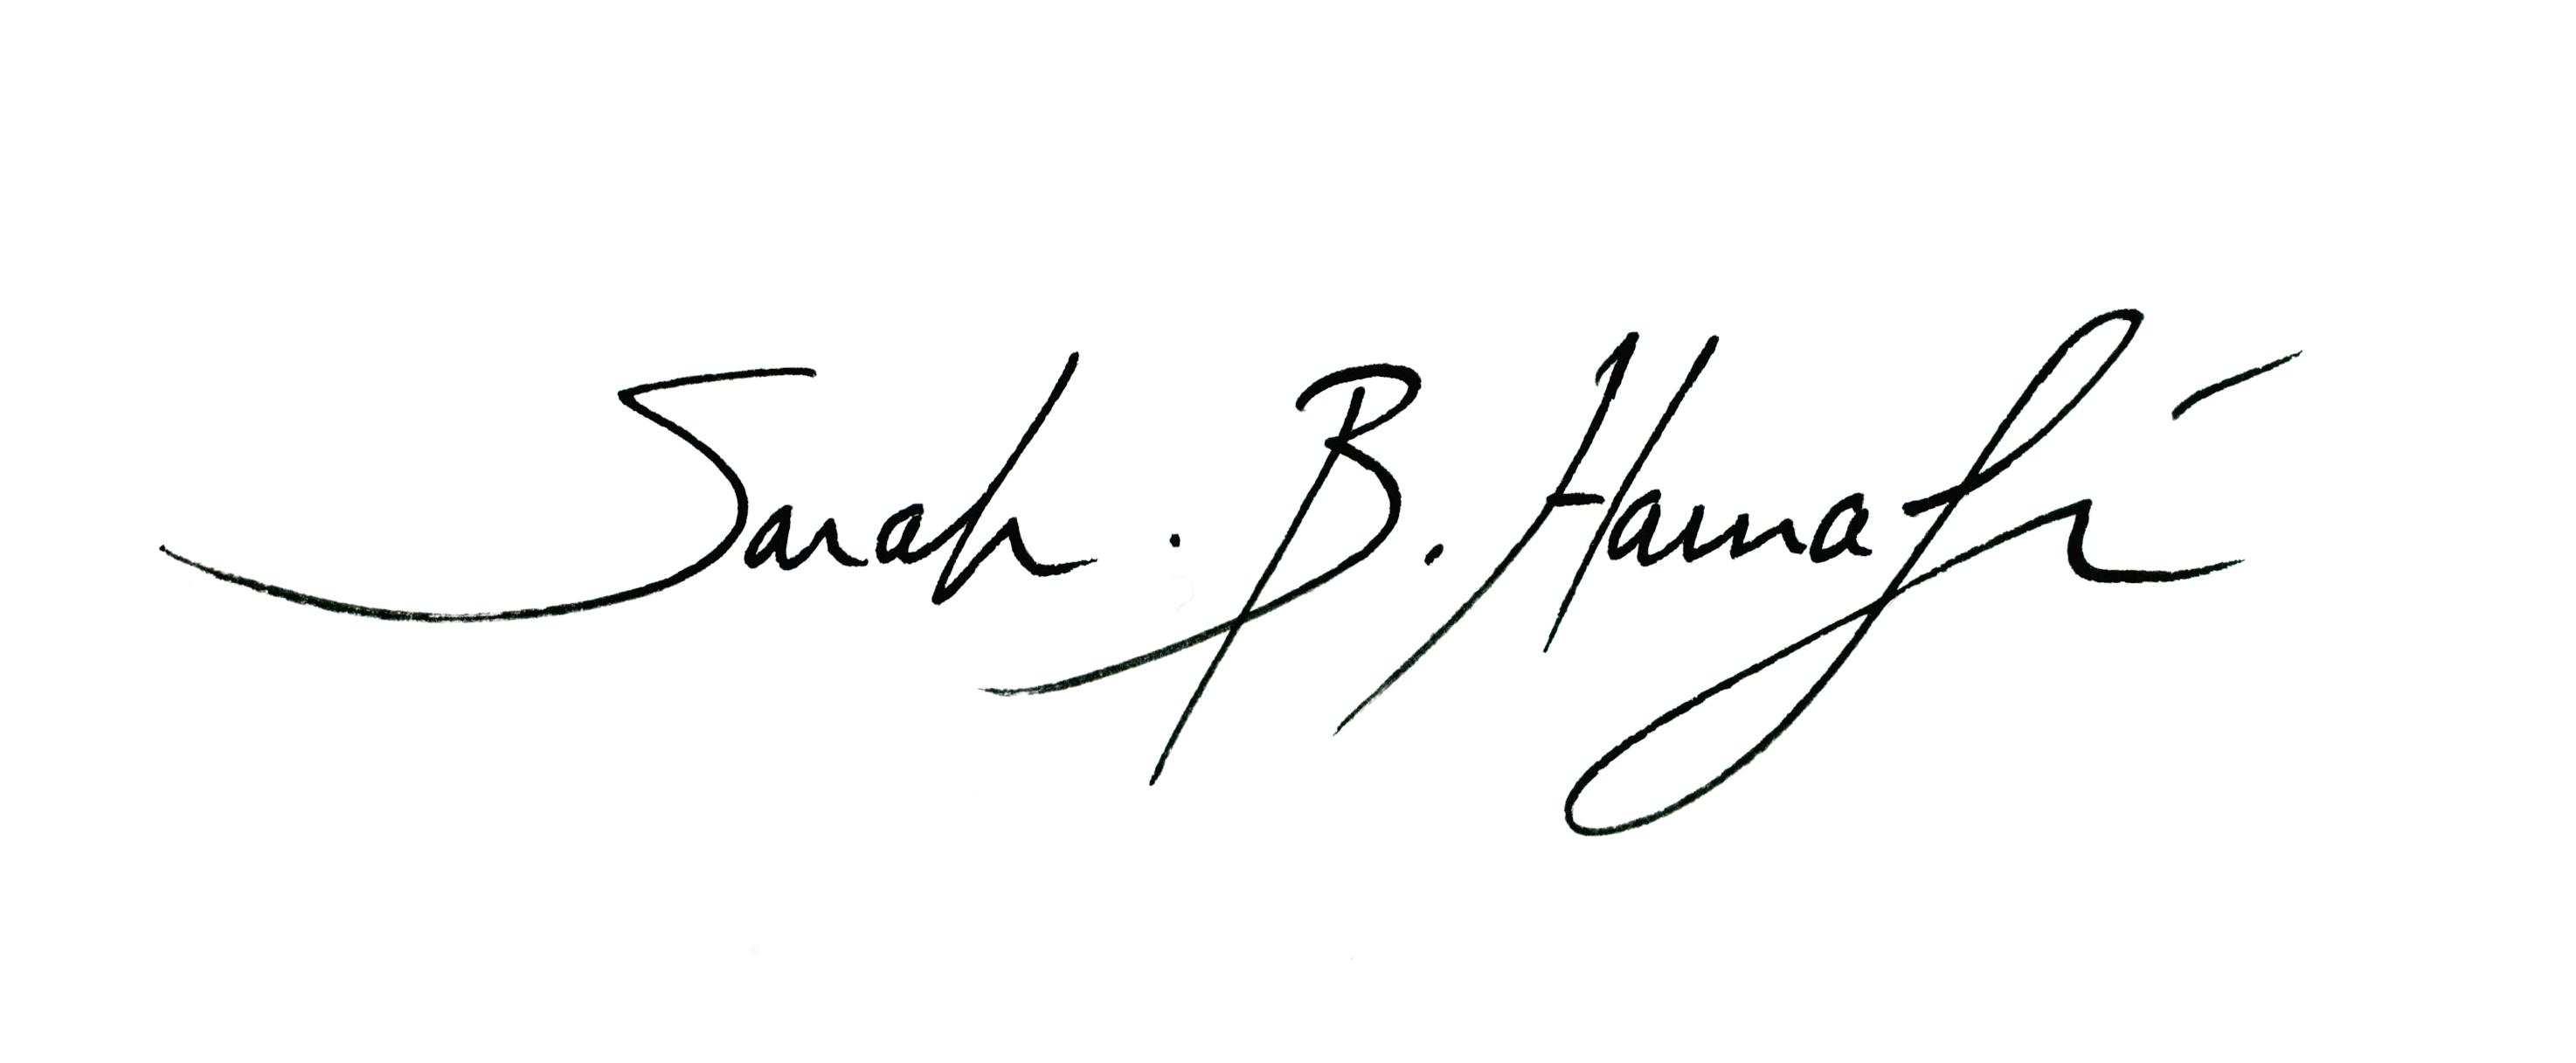 Sarah B. Harnafi Signature